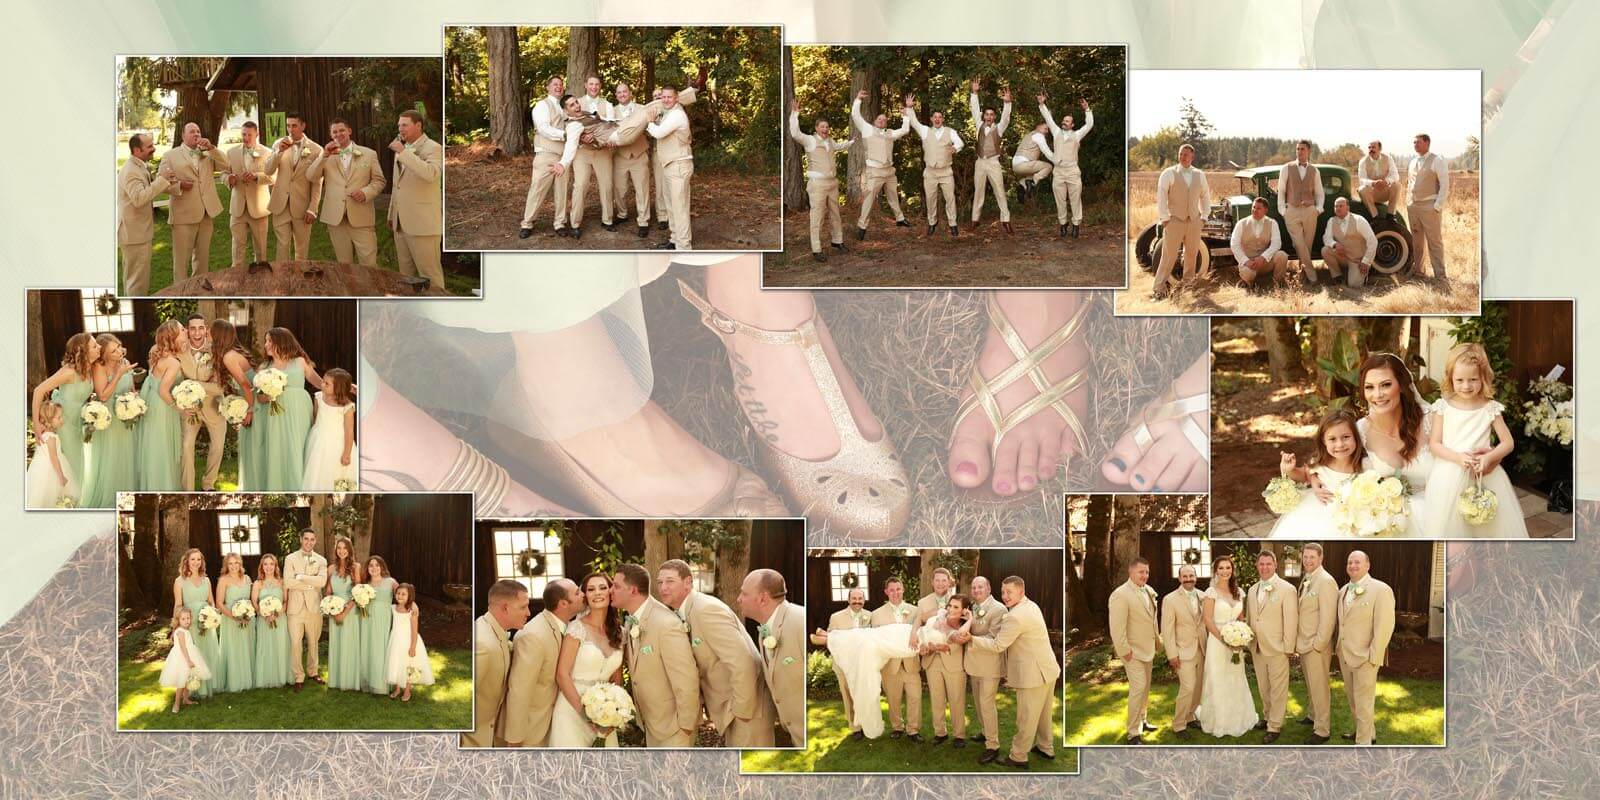 Jasper-House-Farm-Outdoor-Wedding-Lane-County-Oregon-photographers-030-031.jpg